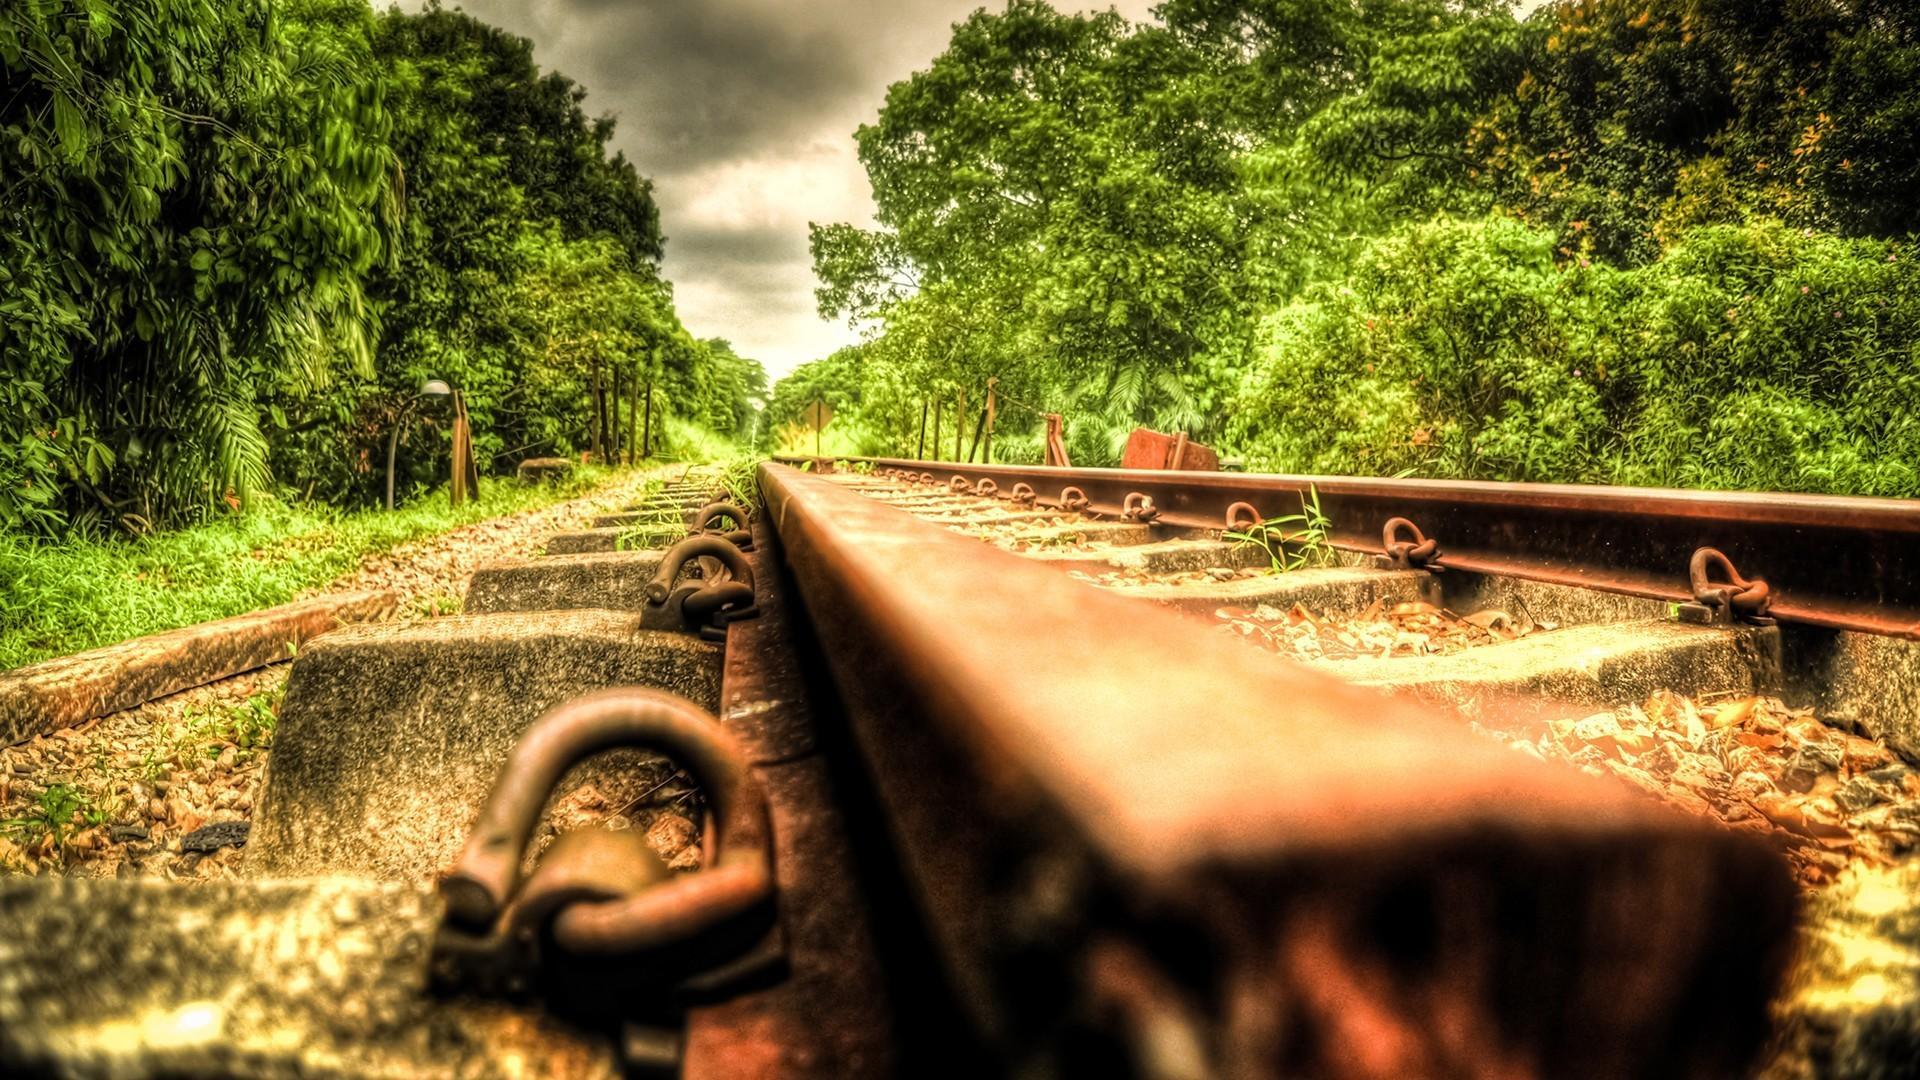 Hdr photography landscapes nature railroads railroad tracks wallpaper 1920x1080